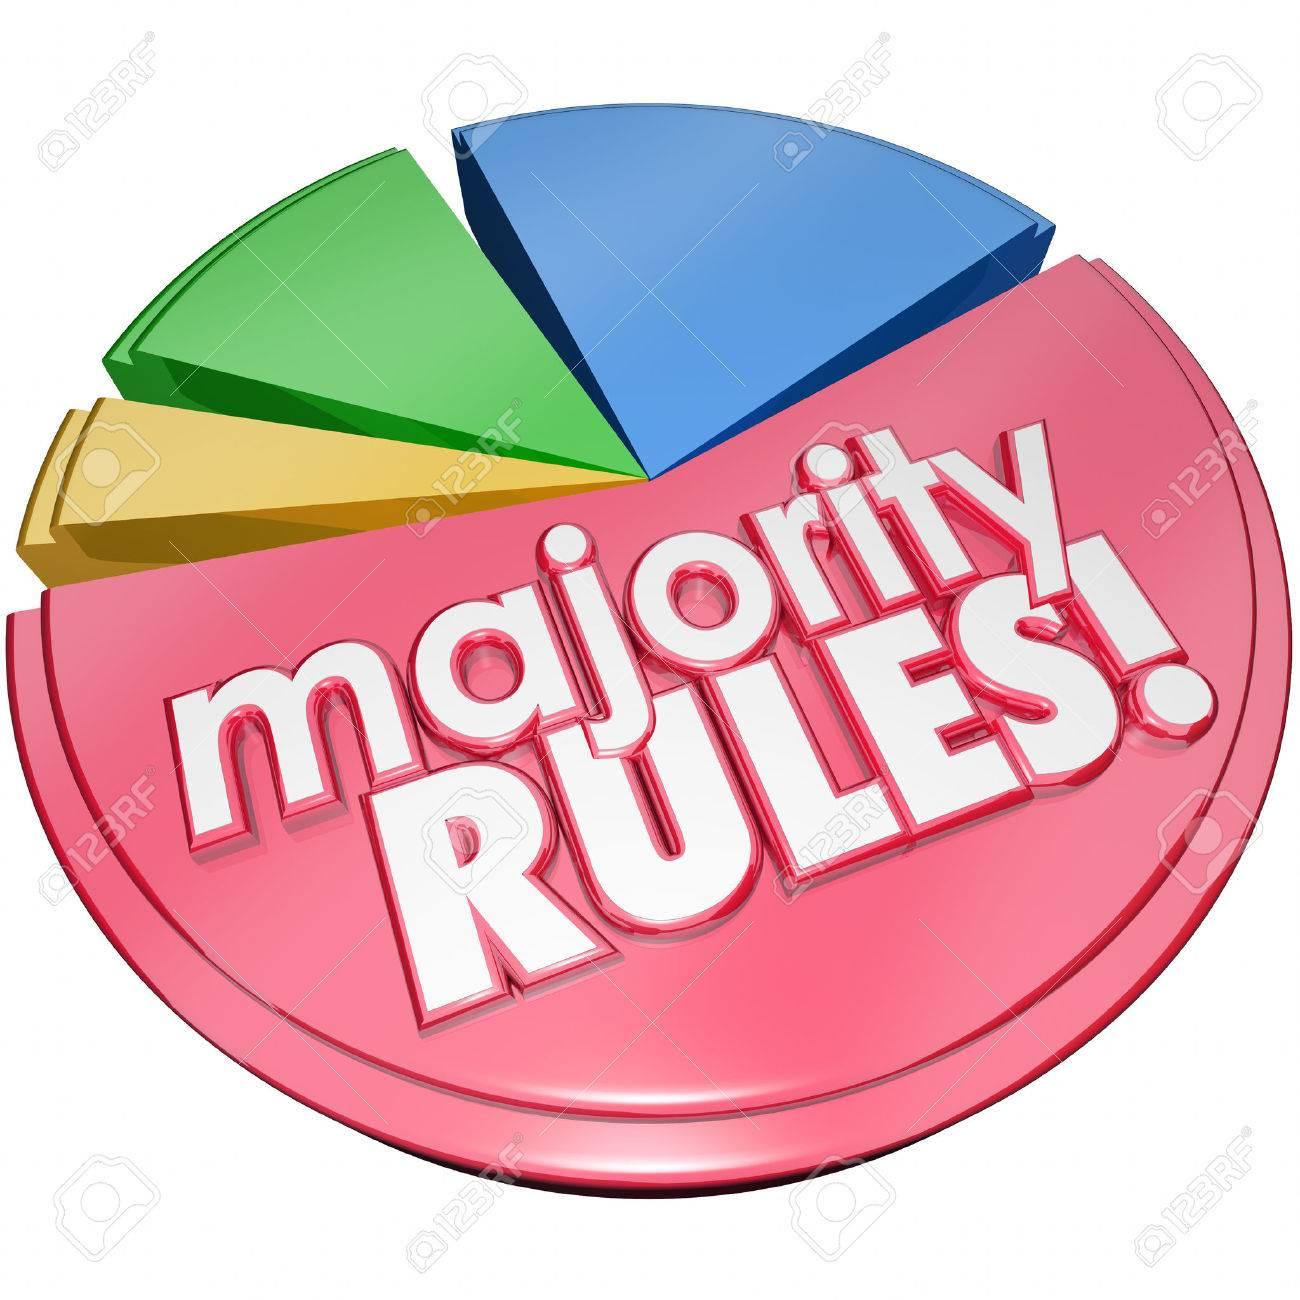 Majority rules words in 3d letters on a pie chart with the largest majority rules words in 3d letters on a pie chart with the largest share of the nvjuhfo Gallery